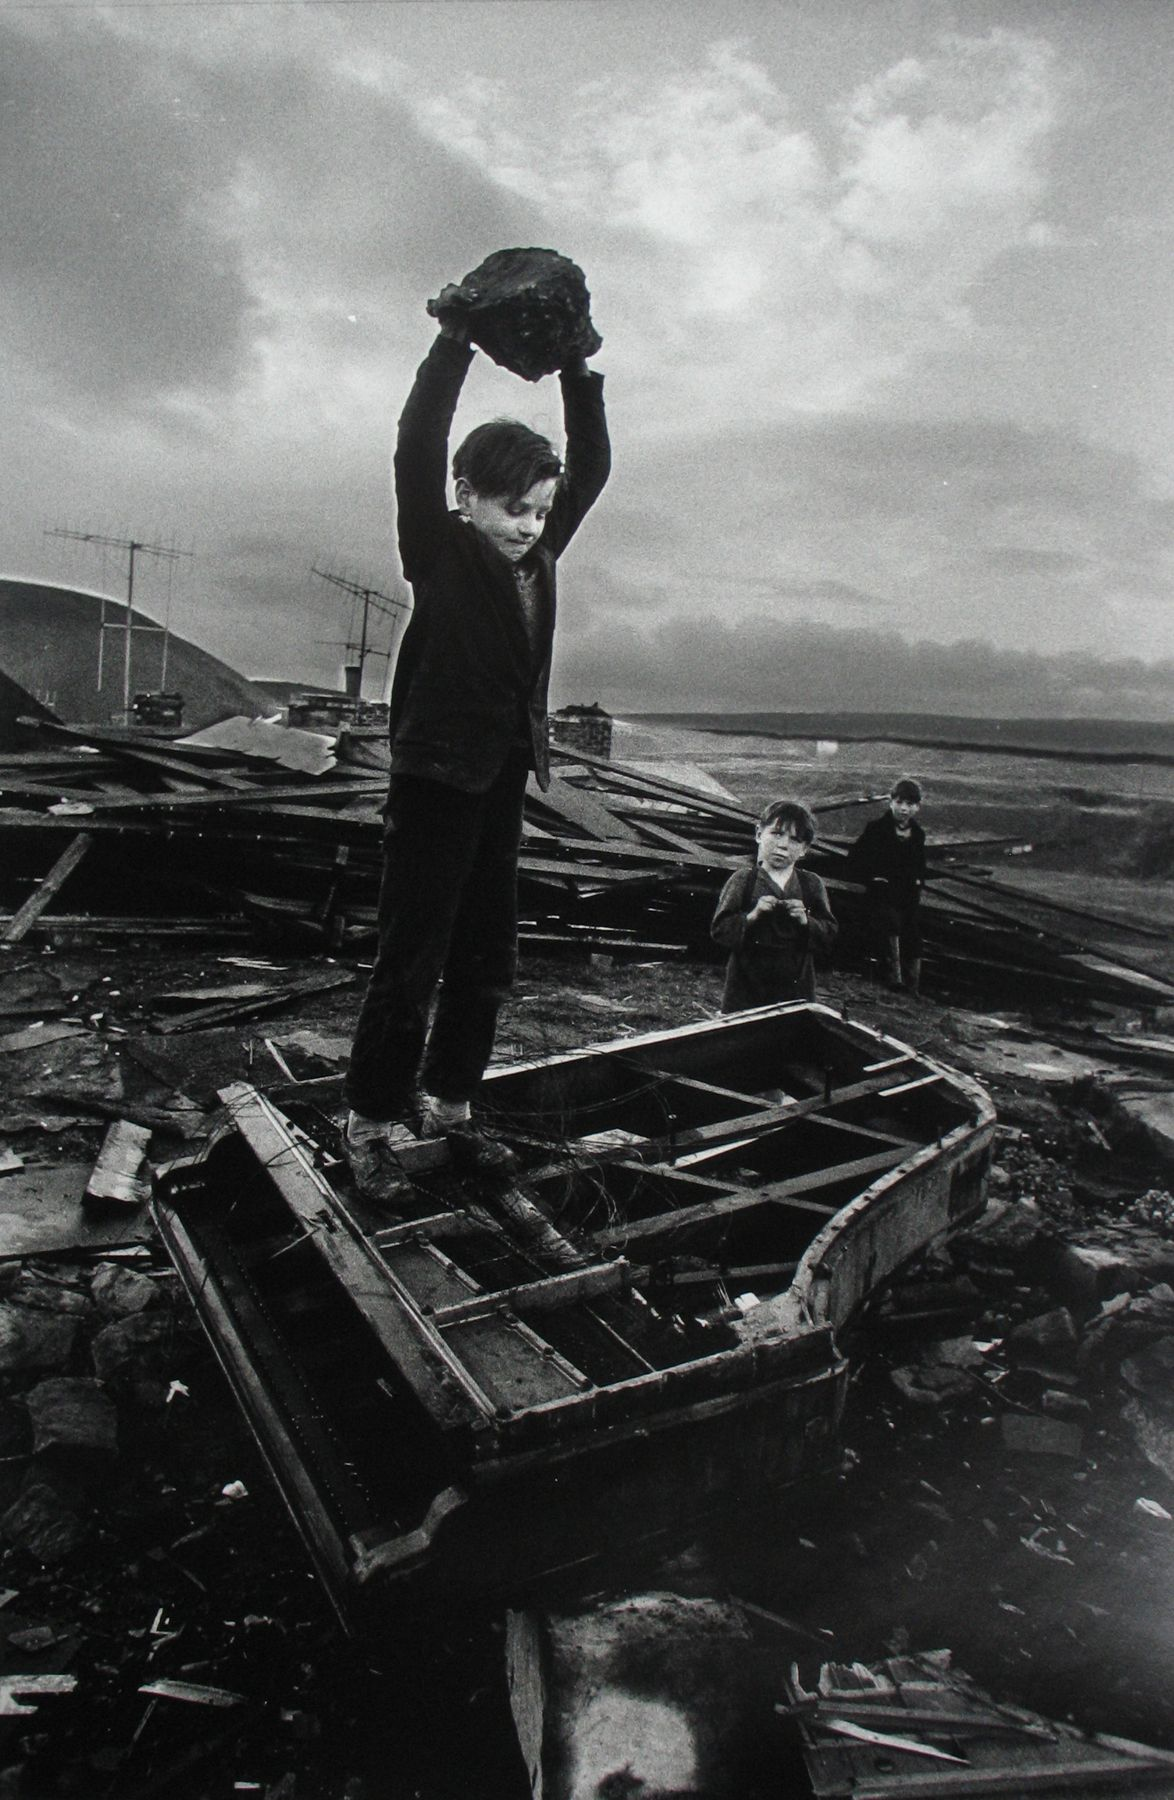 Philip Jones Griffiths - Boy Destroying Piano, Wales, 1961 - Howard Greenberg Gallery - 2018